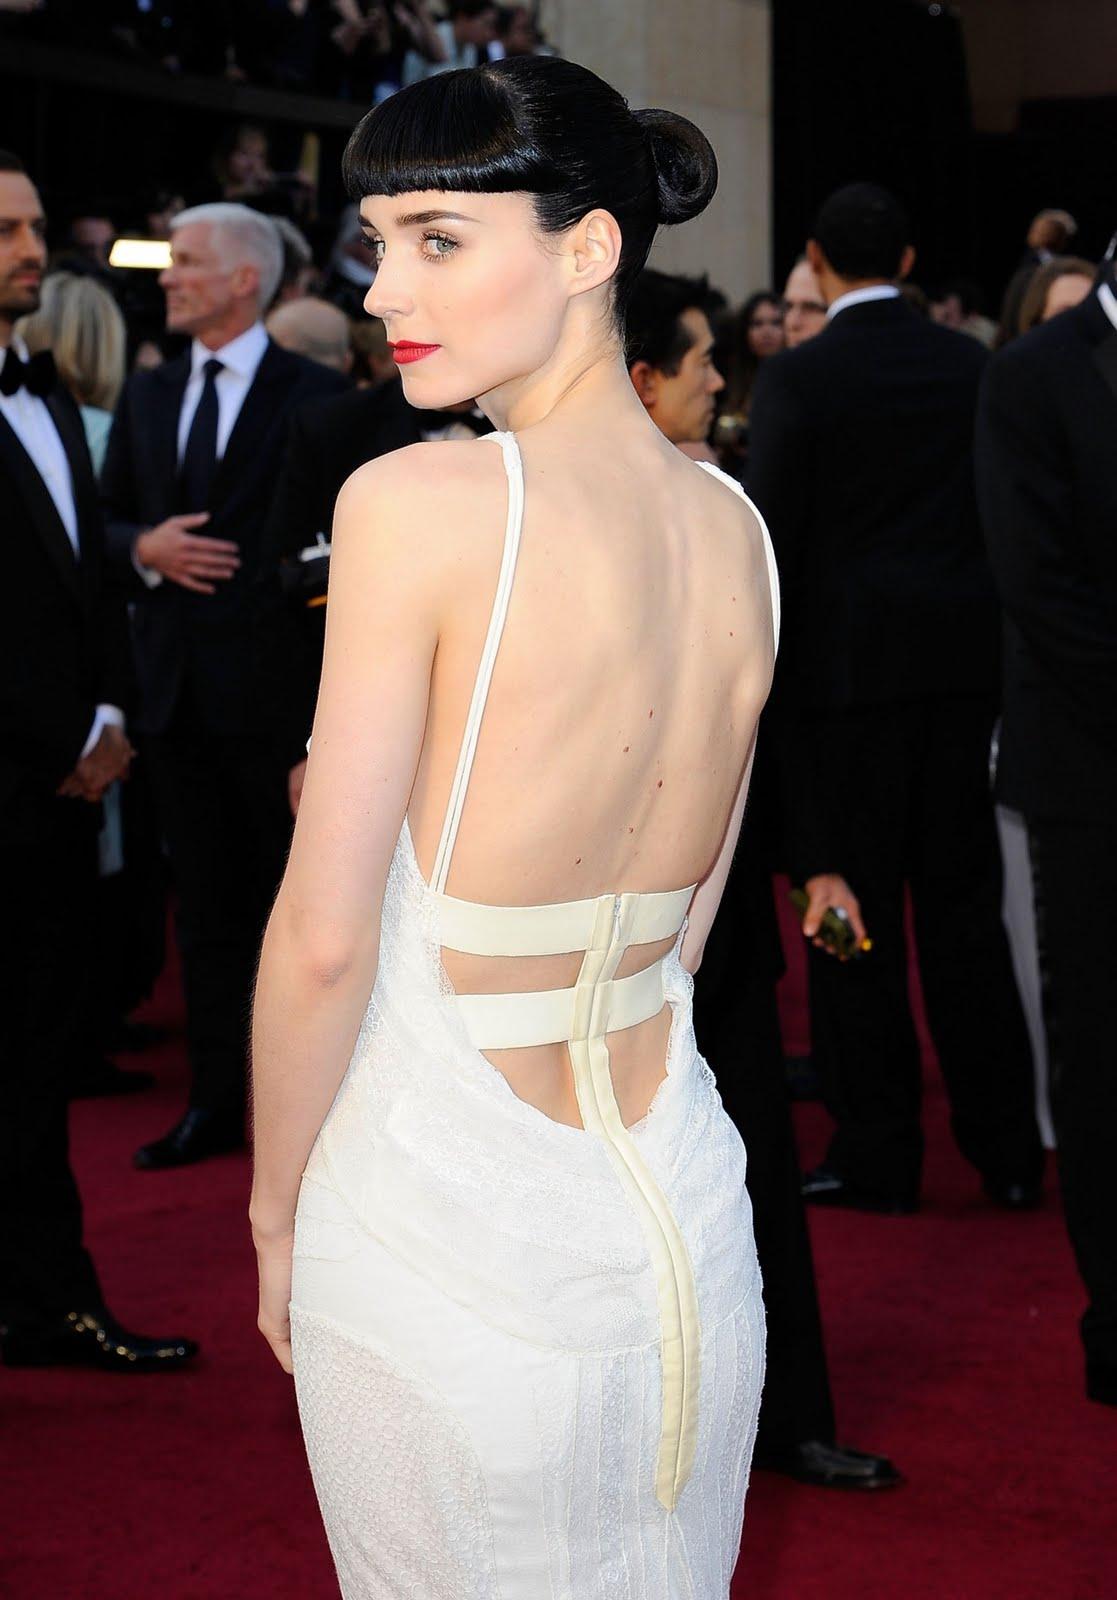 http://2.bp.blogspot.com/-TF19vTGp55w/T0wYSp3yMvI/AAAAAAAAk7A/bDw0sfR_kpQ/s1600/Rooney_Mara-Oscars_2012-5.jpg